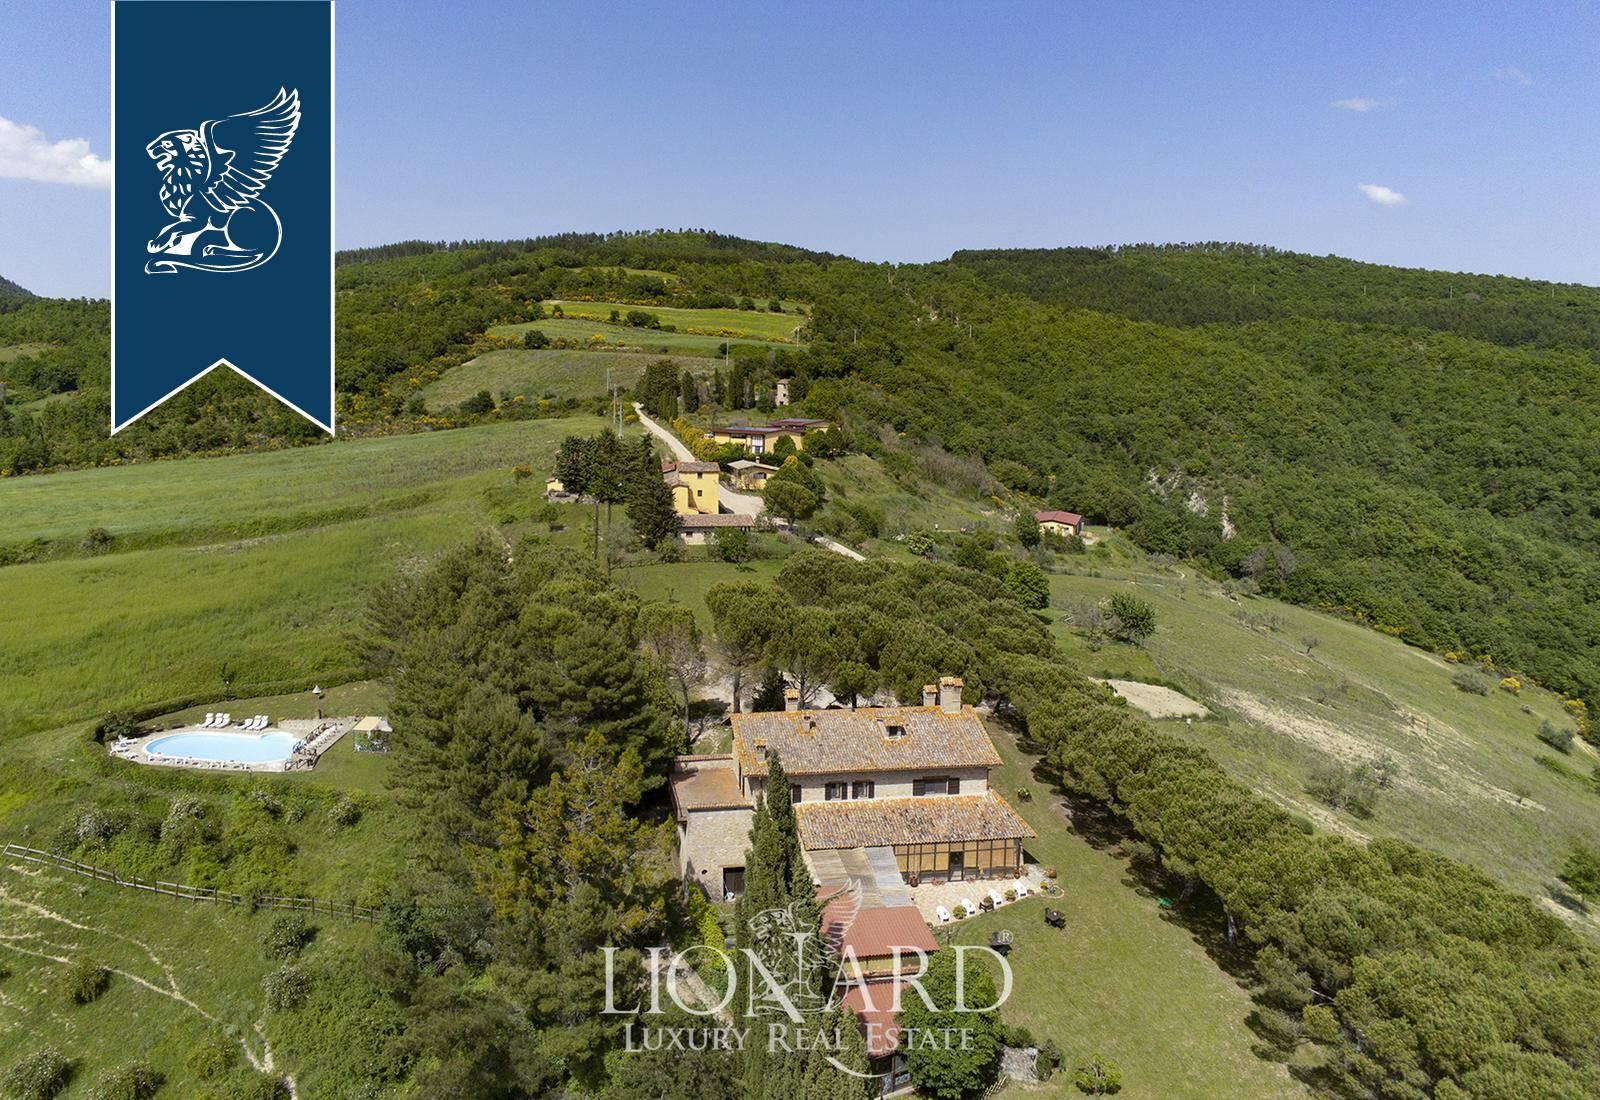 Agriturismo in Vendita a Monte Santa Maria Tiberina: 2000 mq